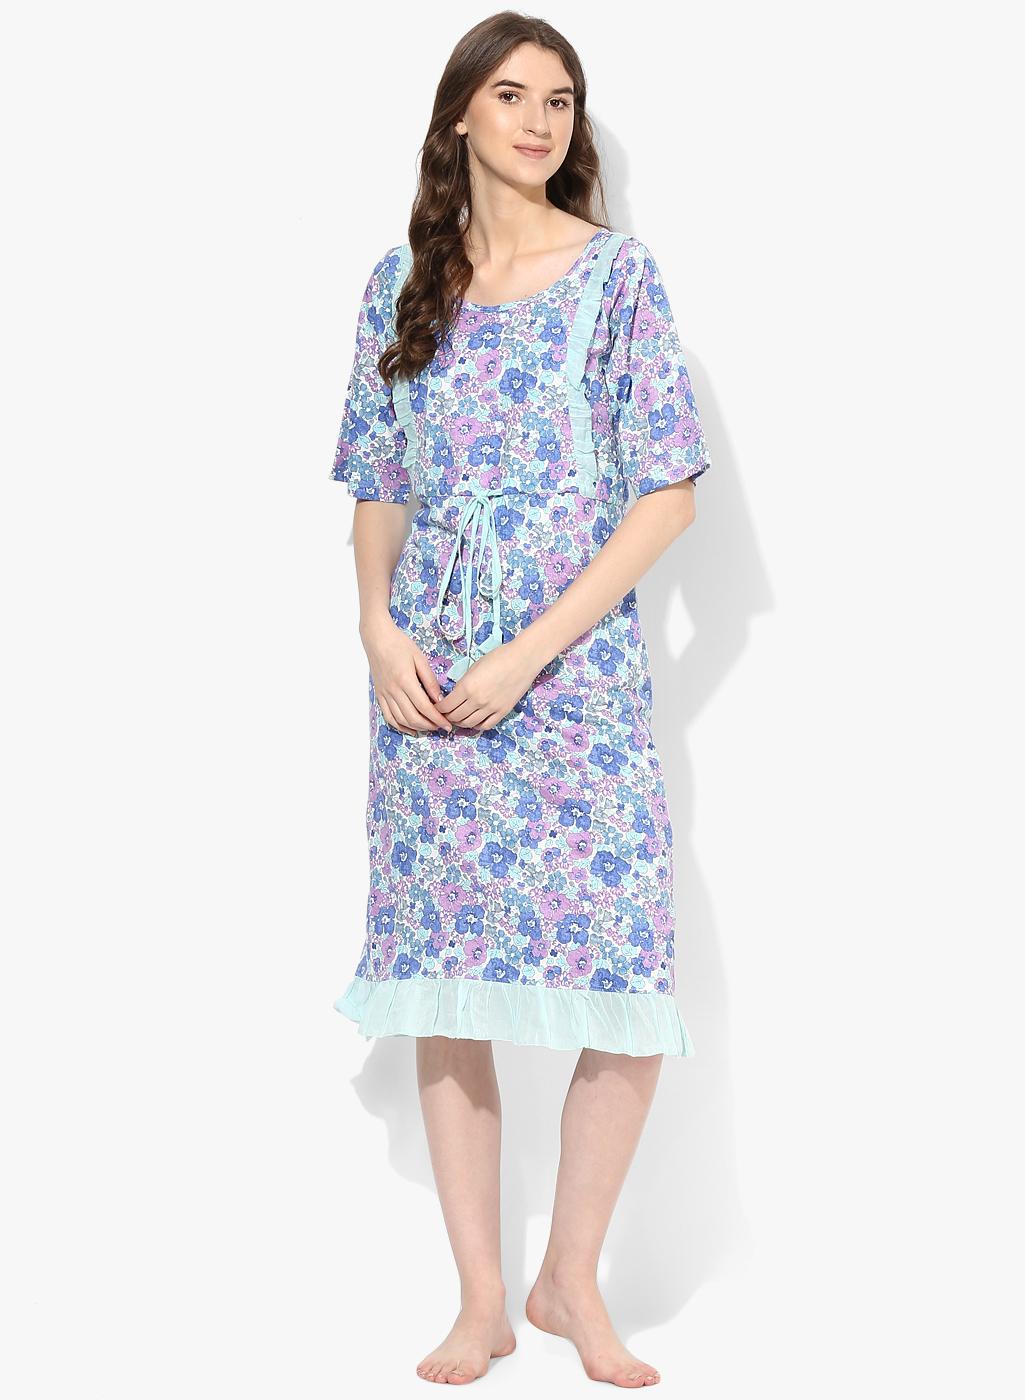 54b0ef261f100 9teenAGAIN Women's Floral Printed Nursing Night Dress - All ...